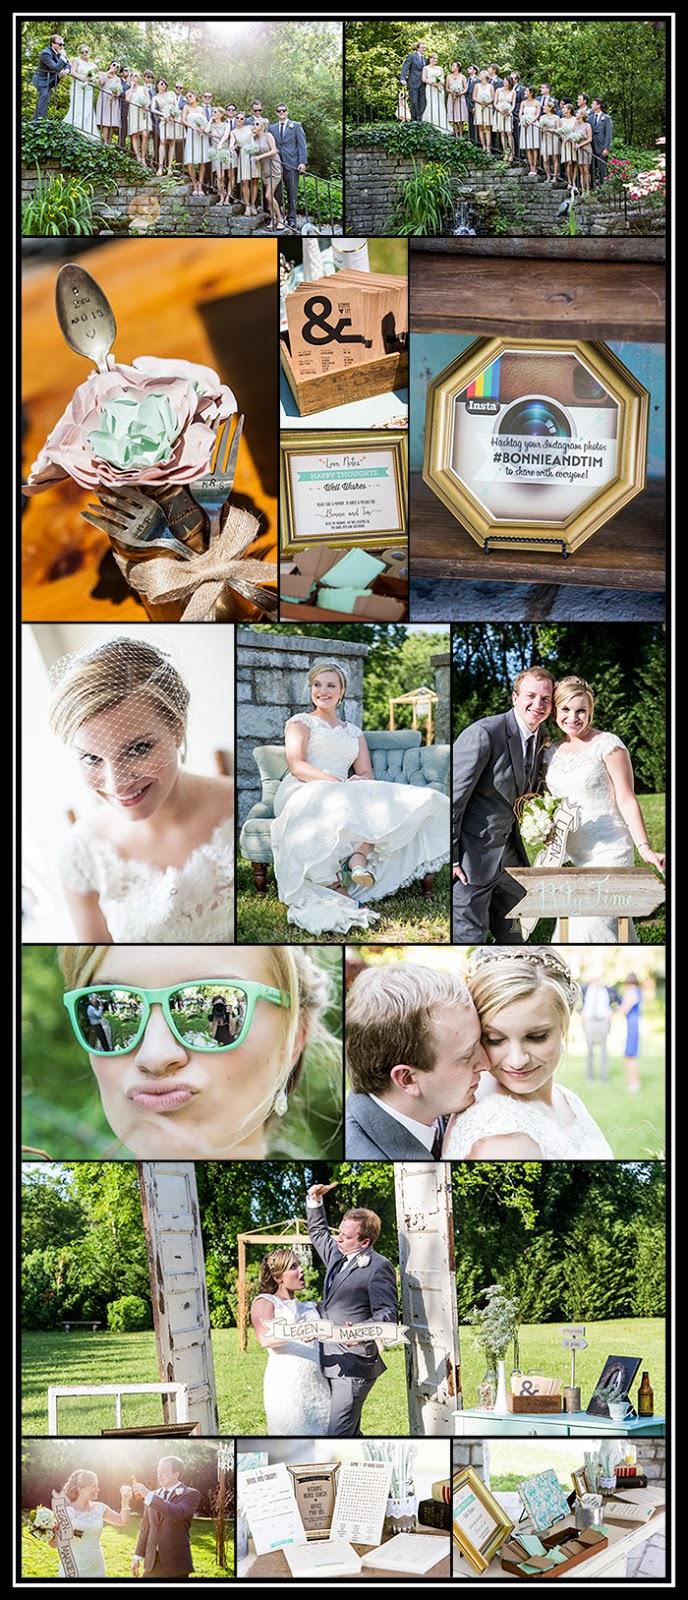 bride, groom, instagram, wedding decor, sunflare, sun flare, wedding, vintage inspiration